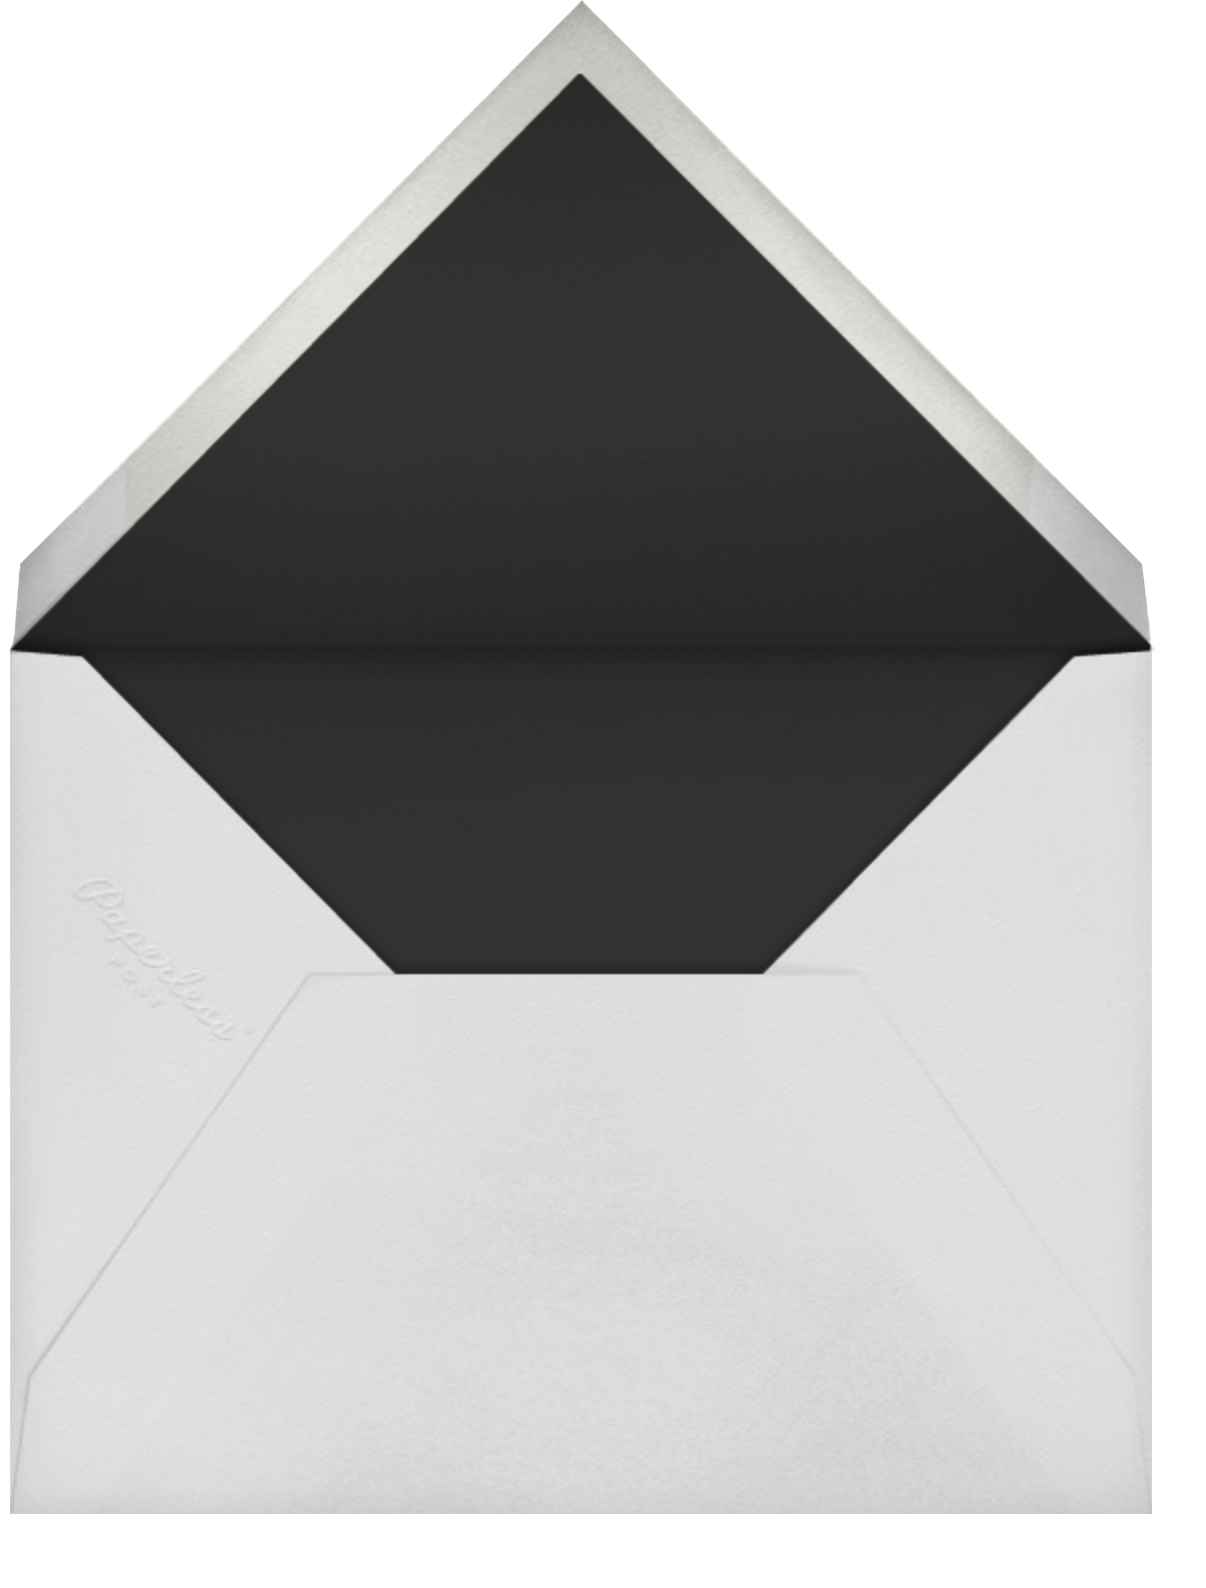 Durham - Black - Paperless Post - Anniversary party - envelope back